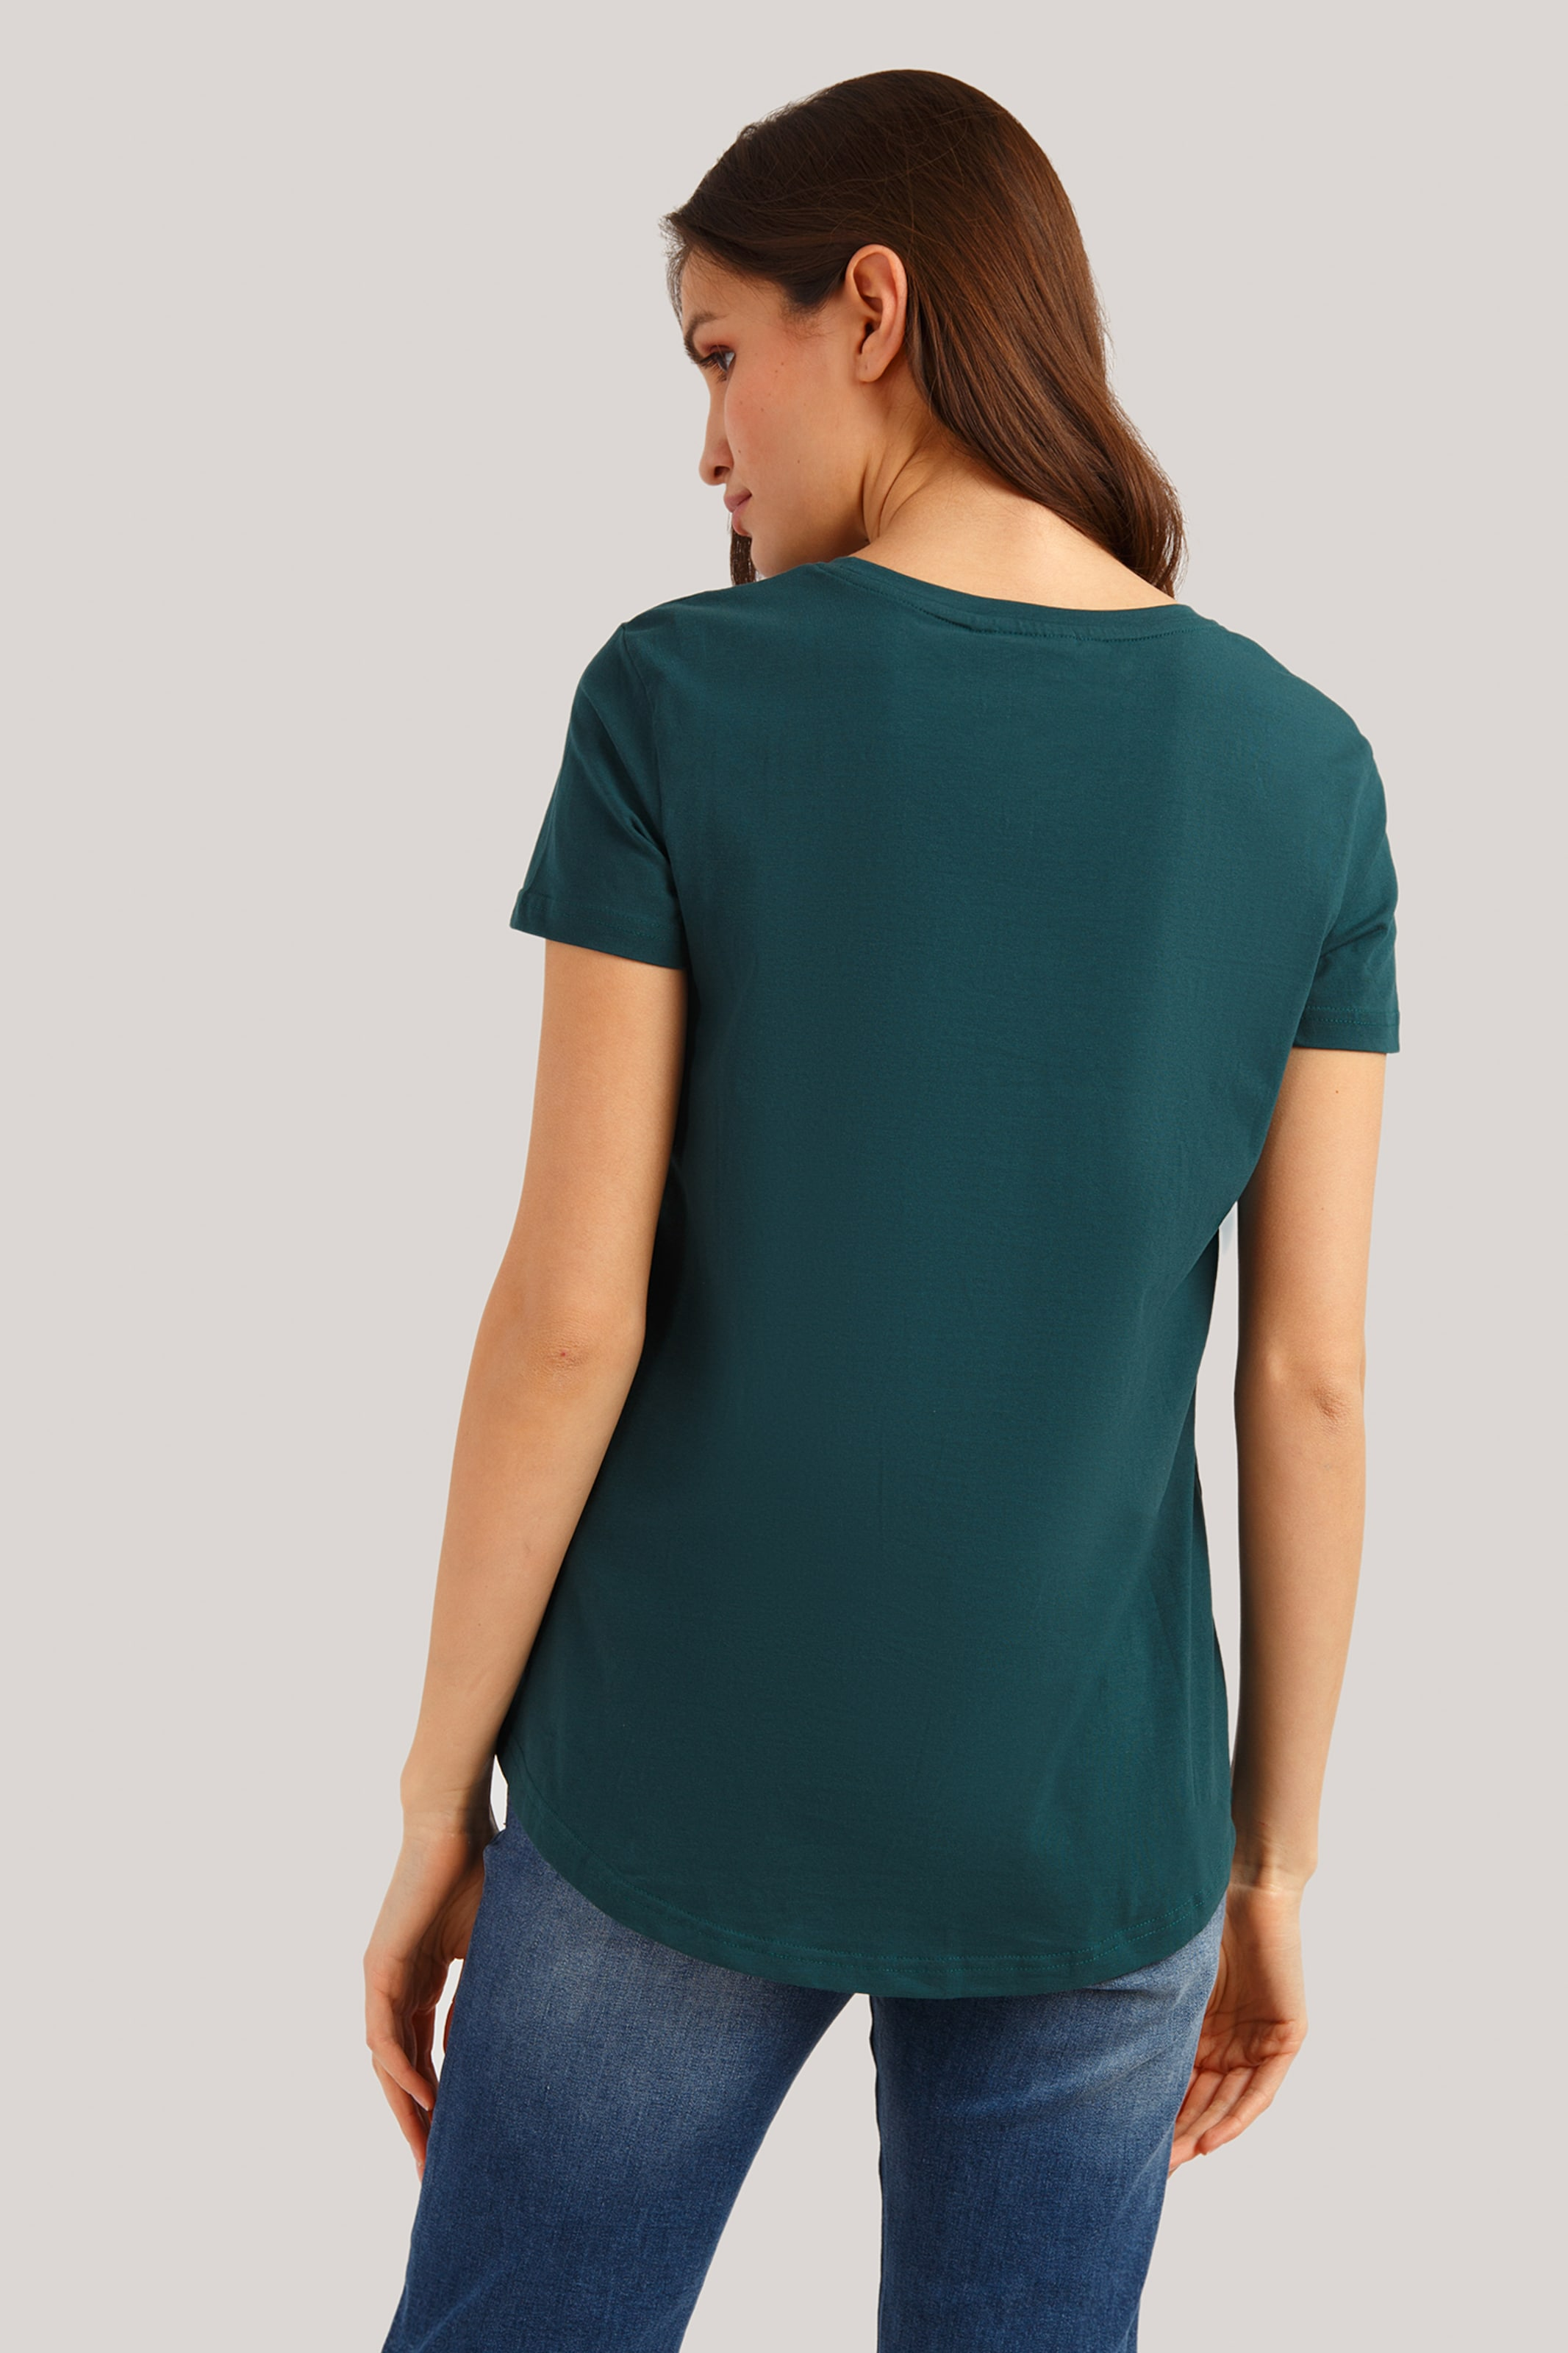 In Finn T Flare TanneMischfarben shirt kXP8OwNn0Z